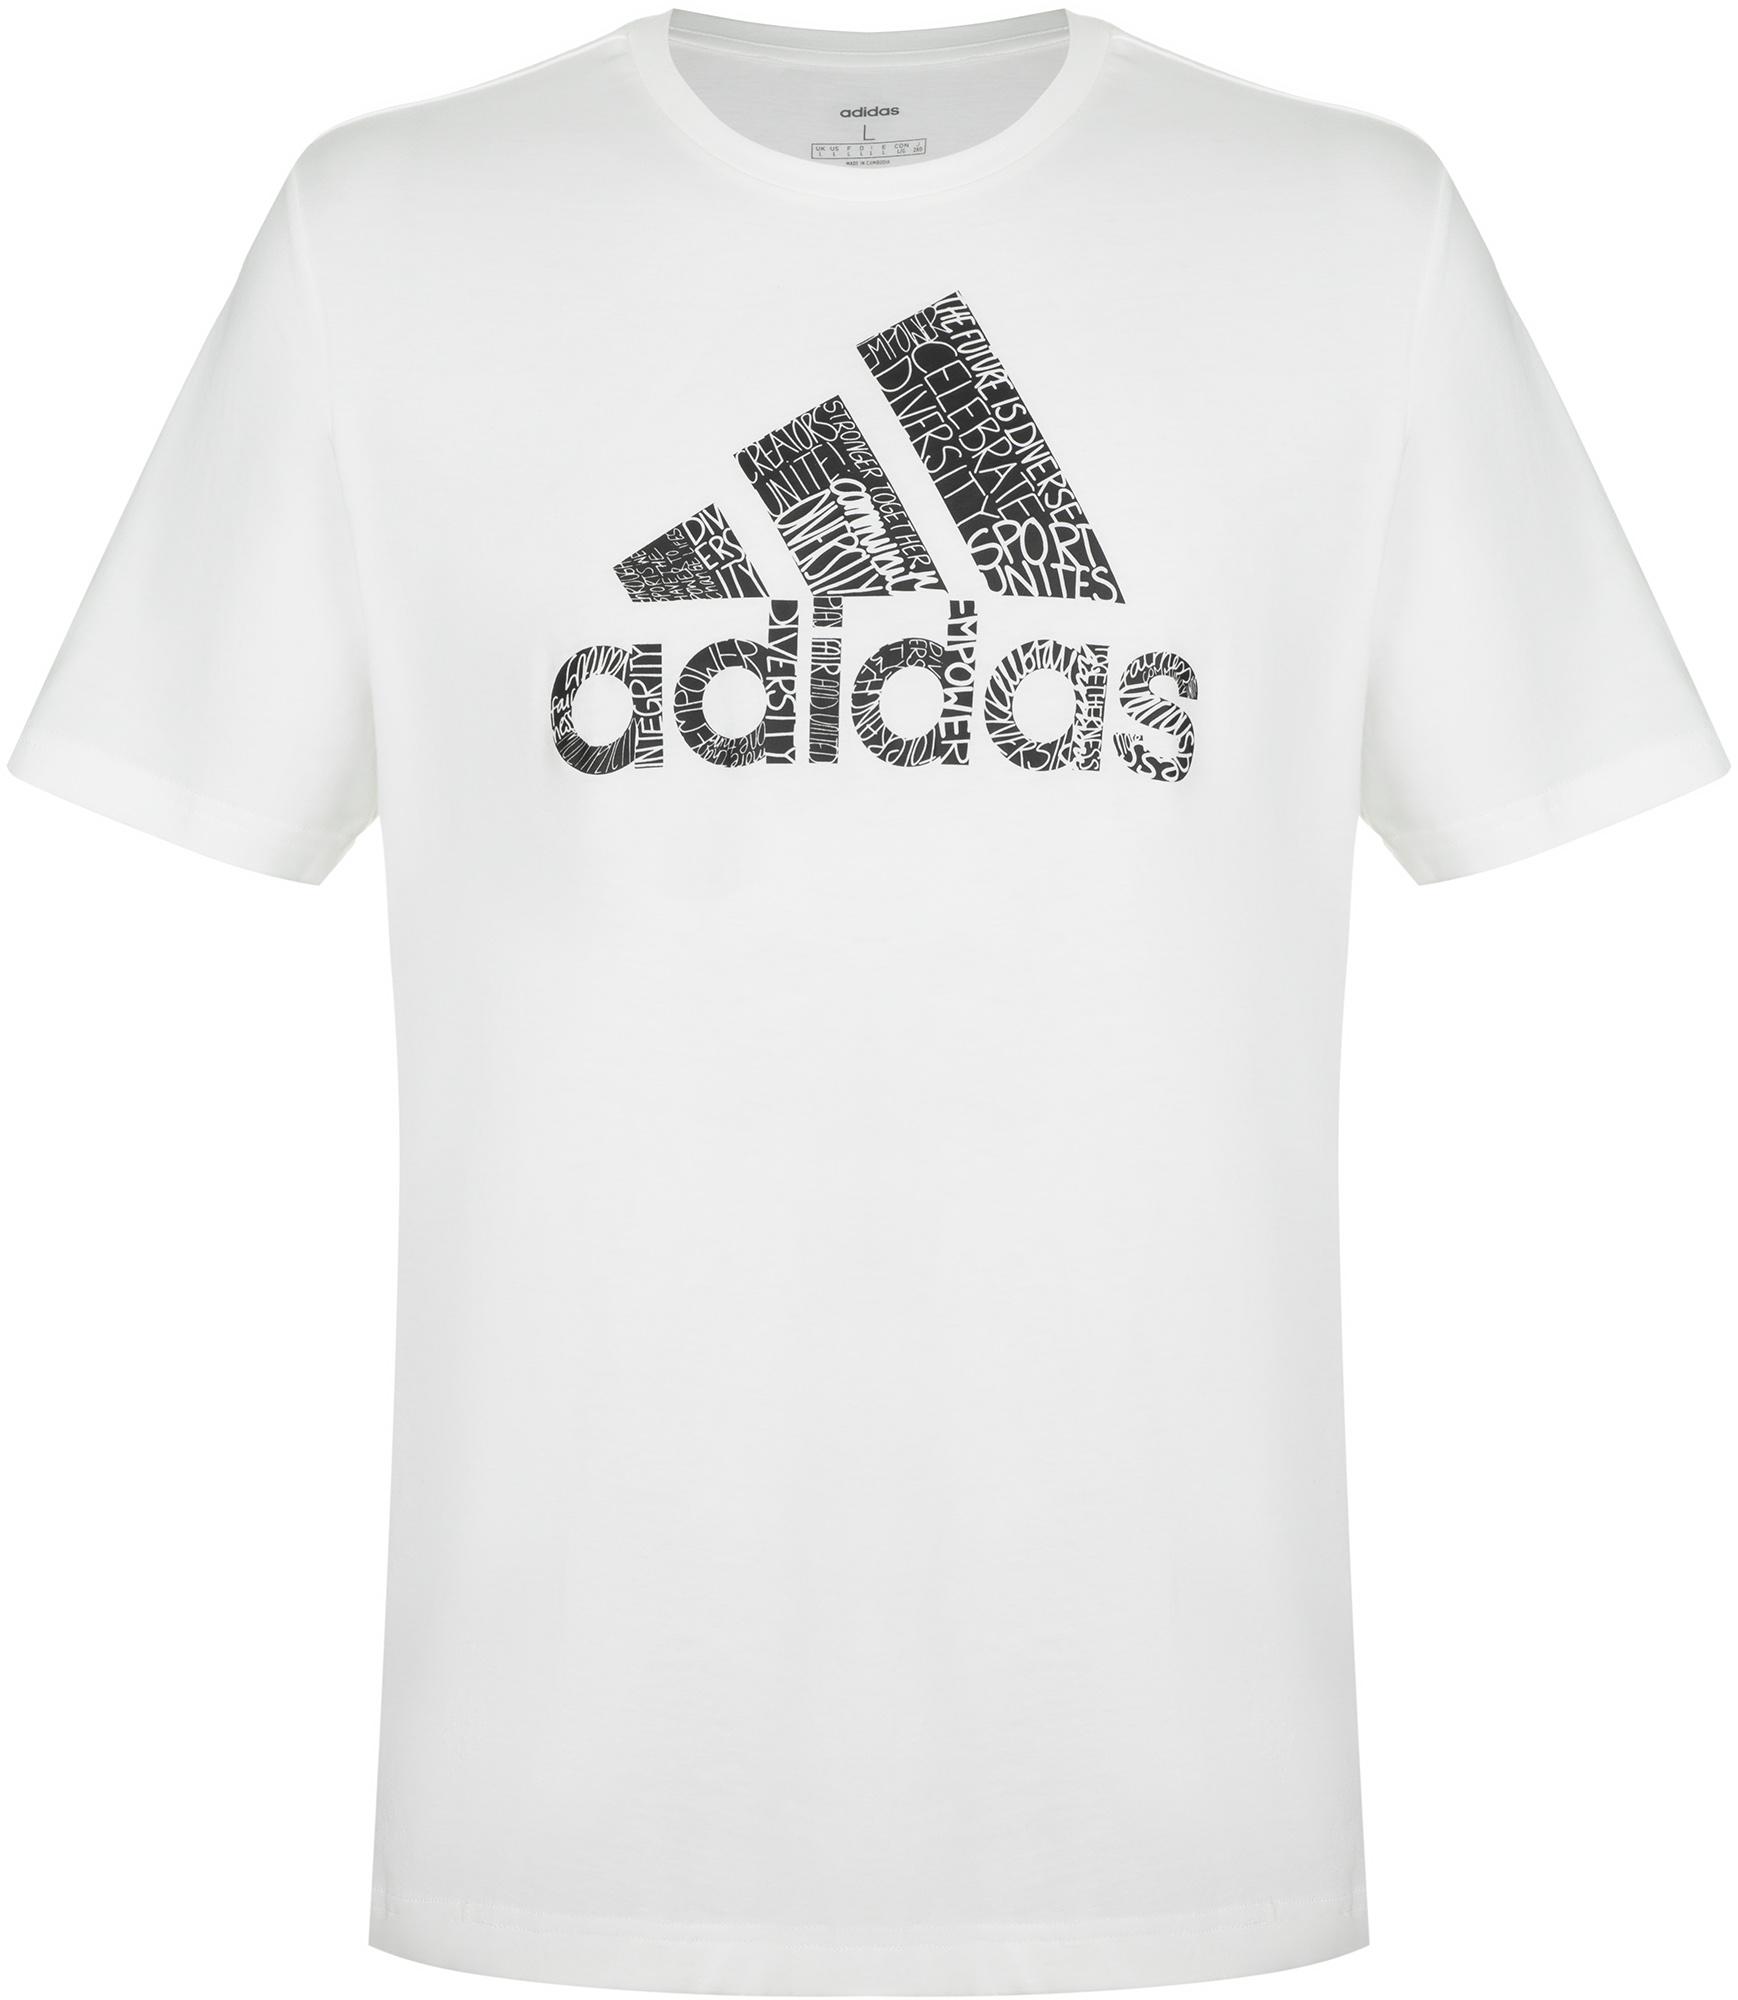 Adidas Футболка мужская adidas Unity, размер 56-58